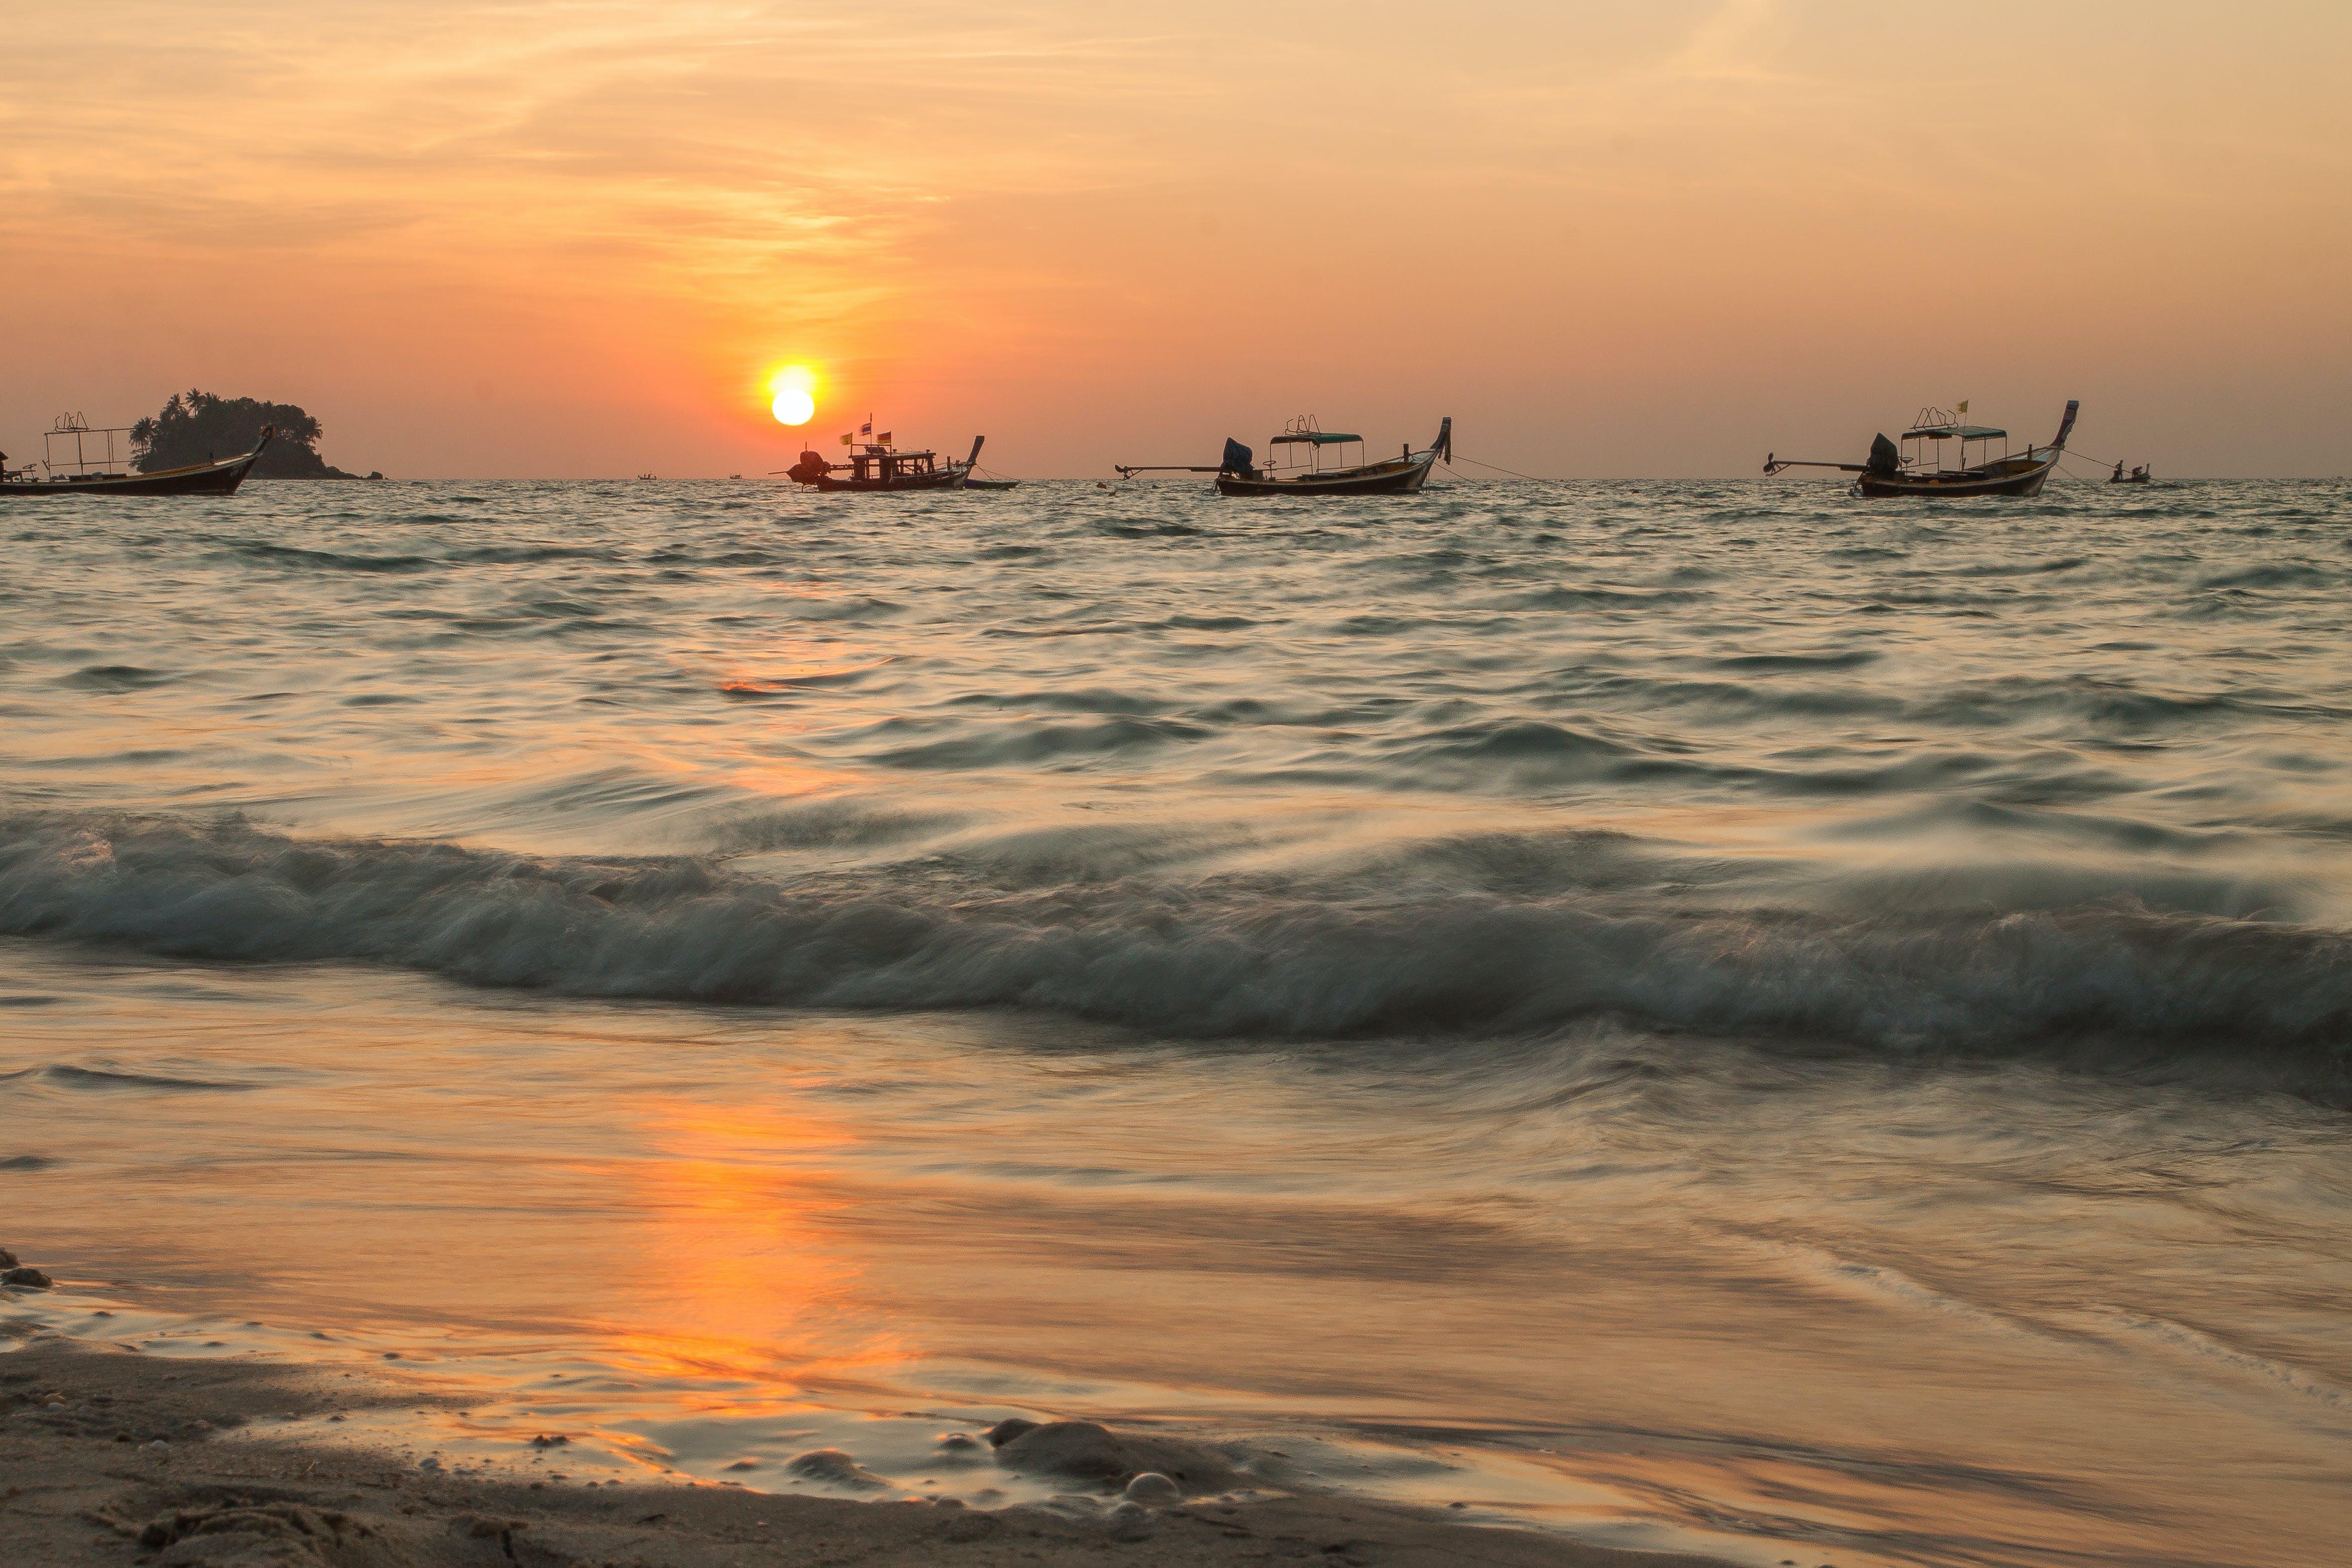 Free stock photo of beach, boat, long boat, mirophotography.wordpress.com